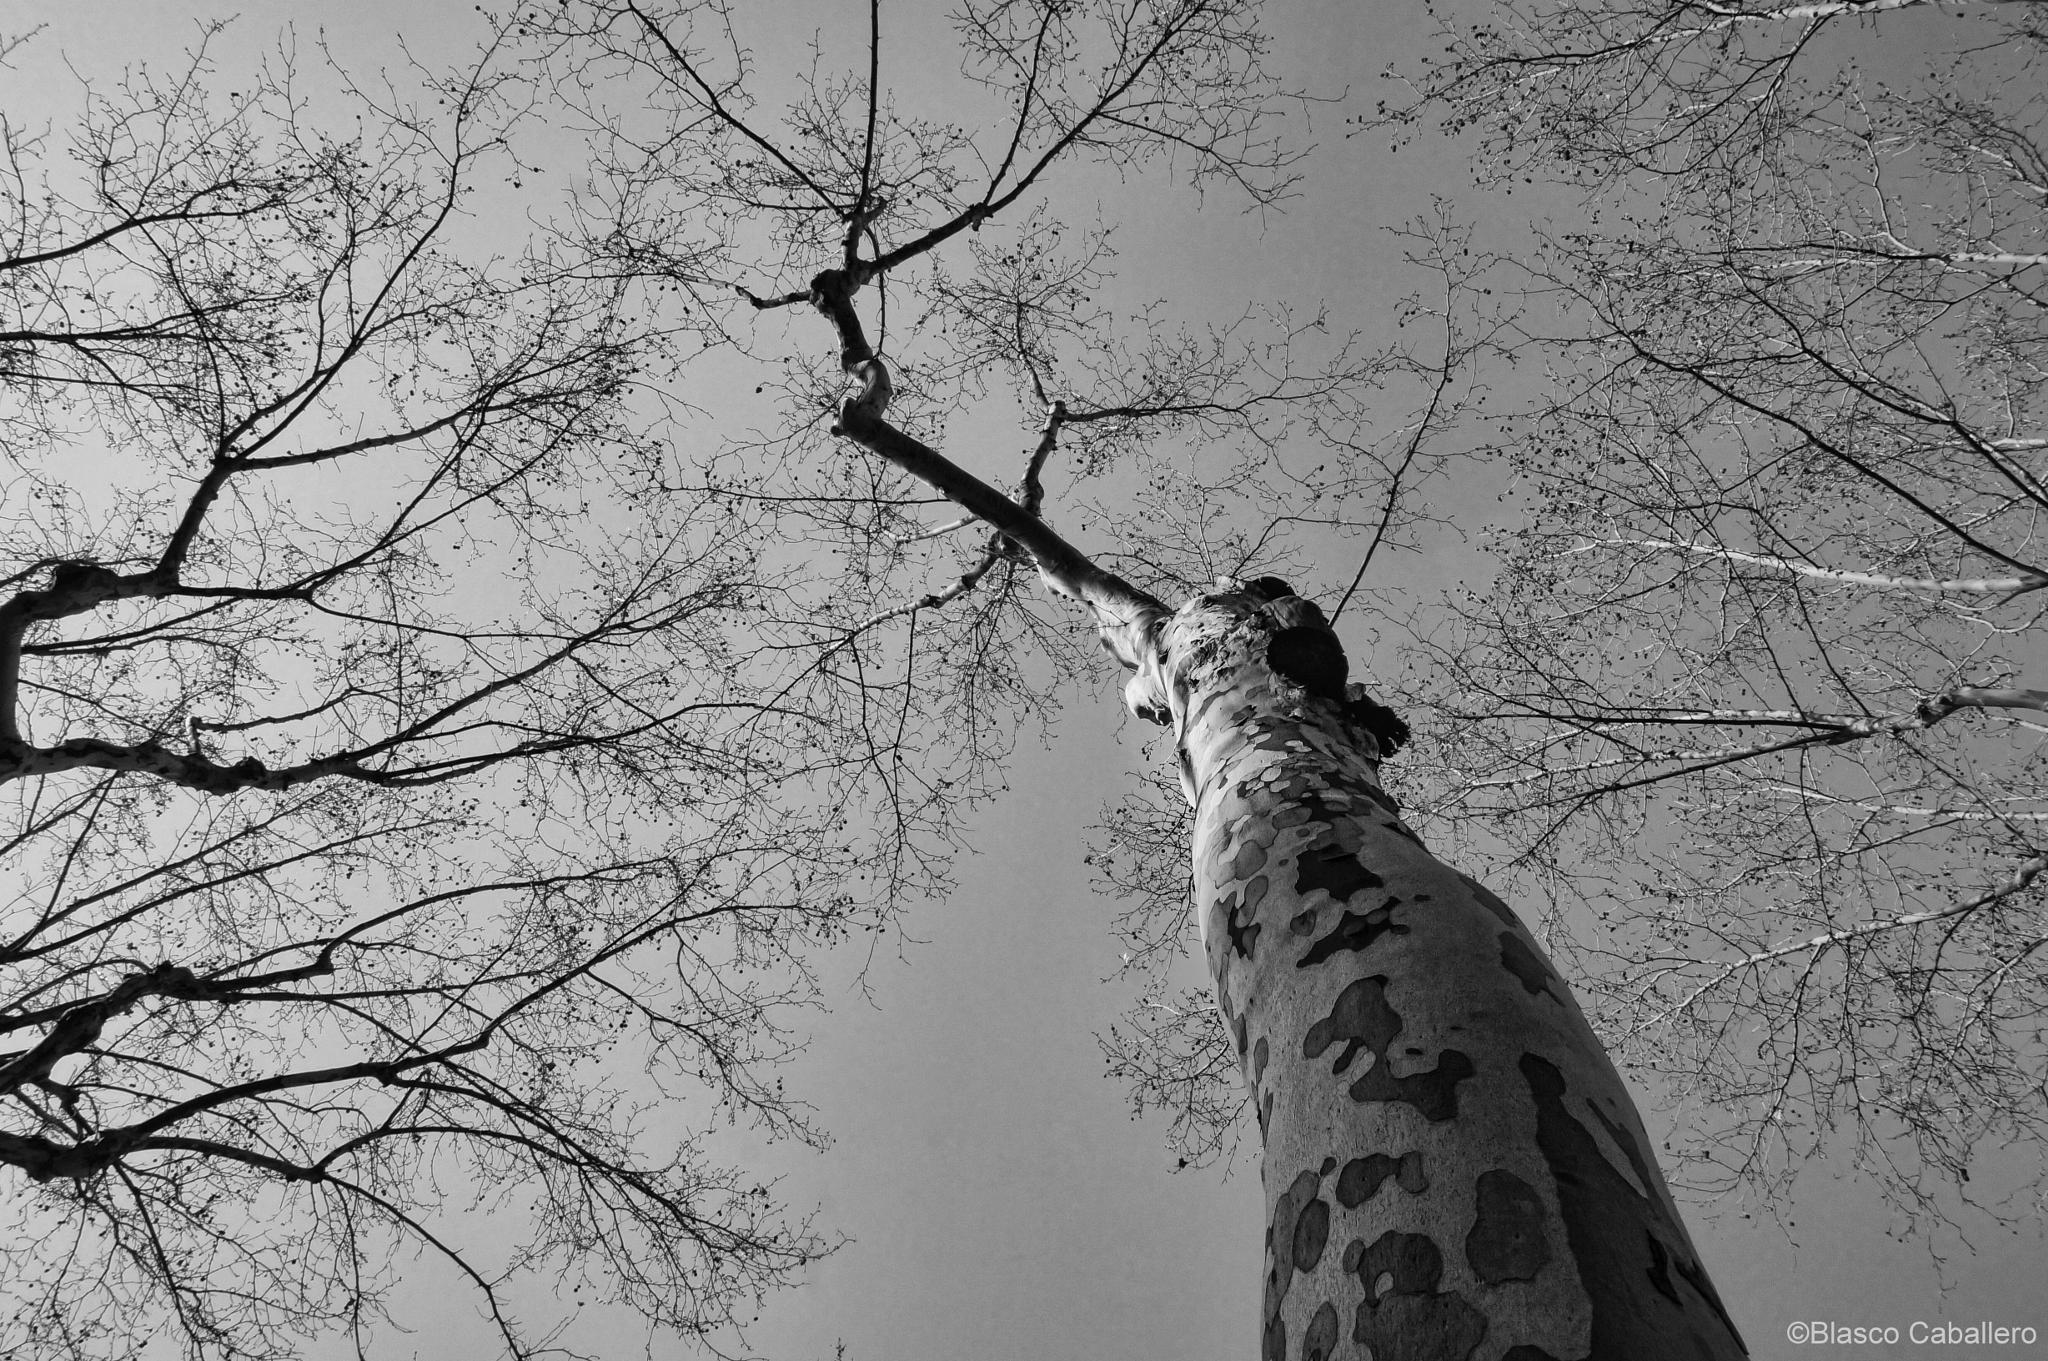 TREE & SKY by Blasco Caballero